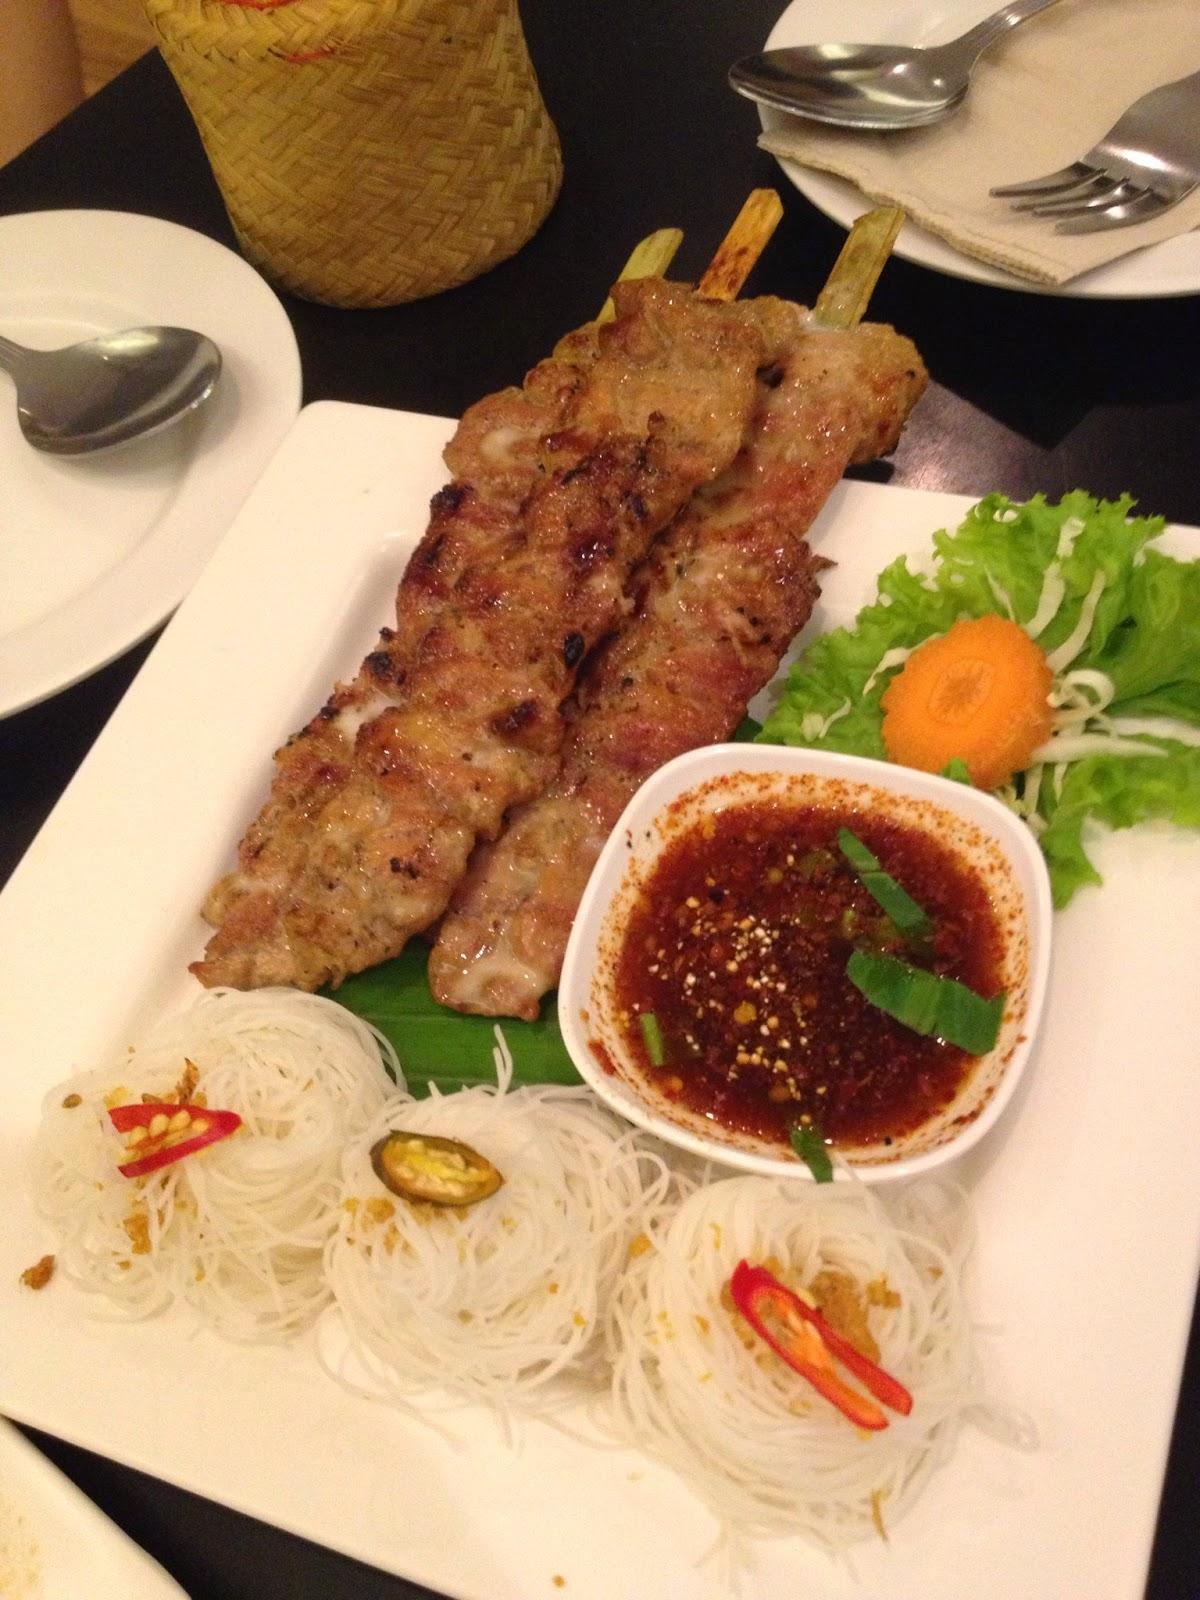 Bangkok - Coconut milk marinated pork skewers